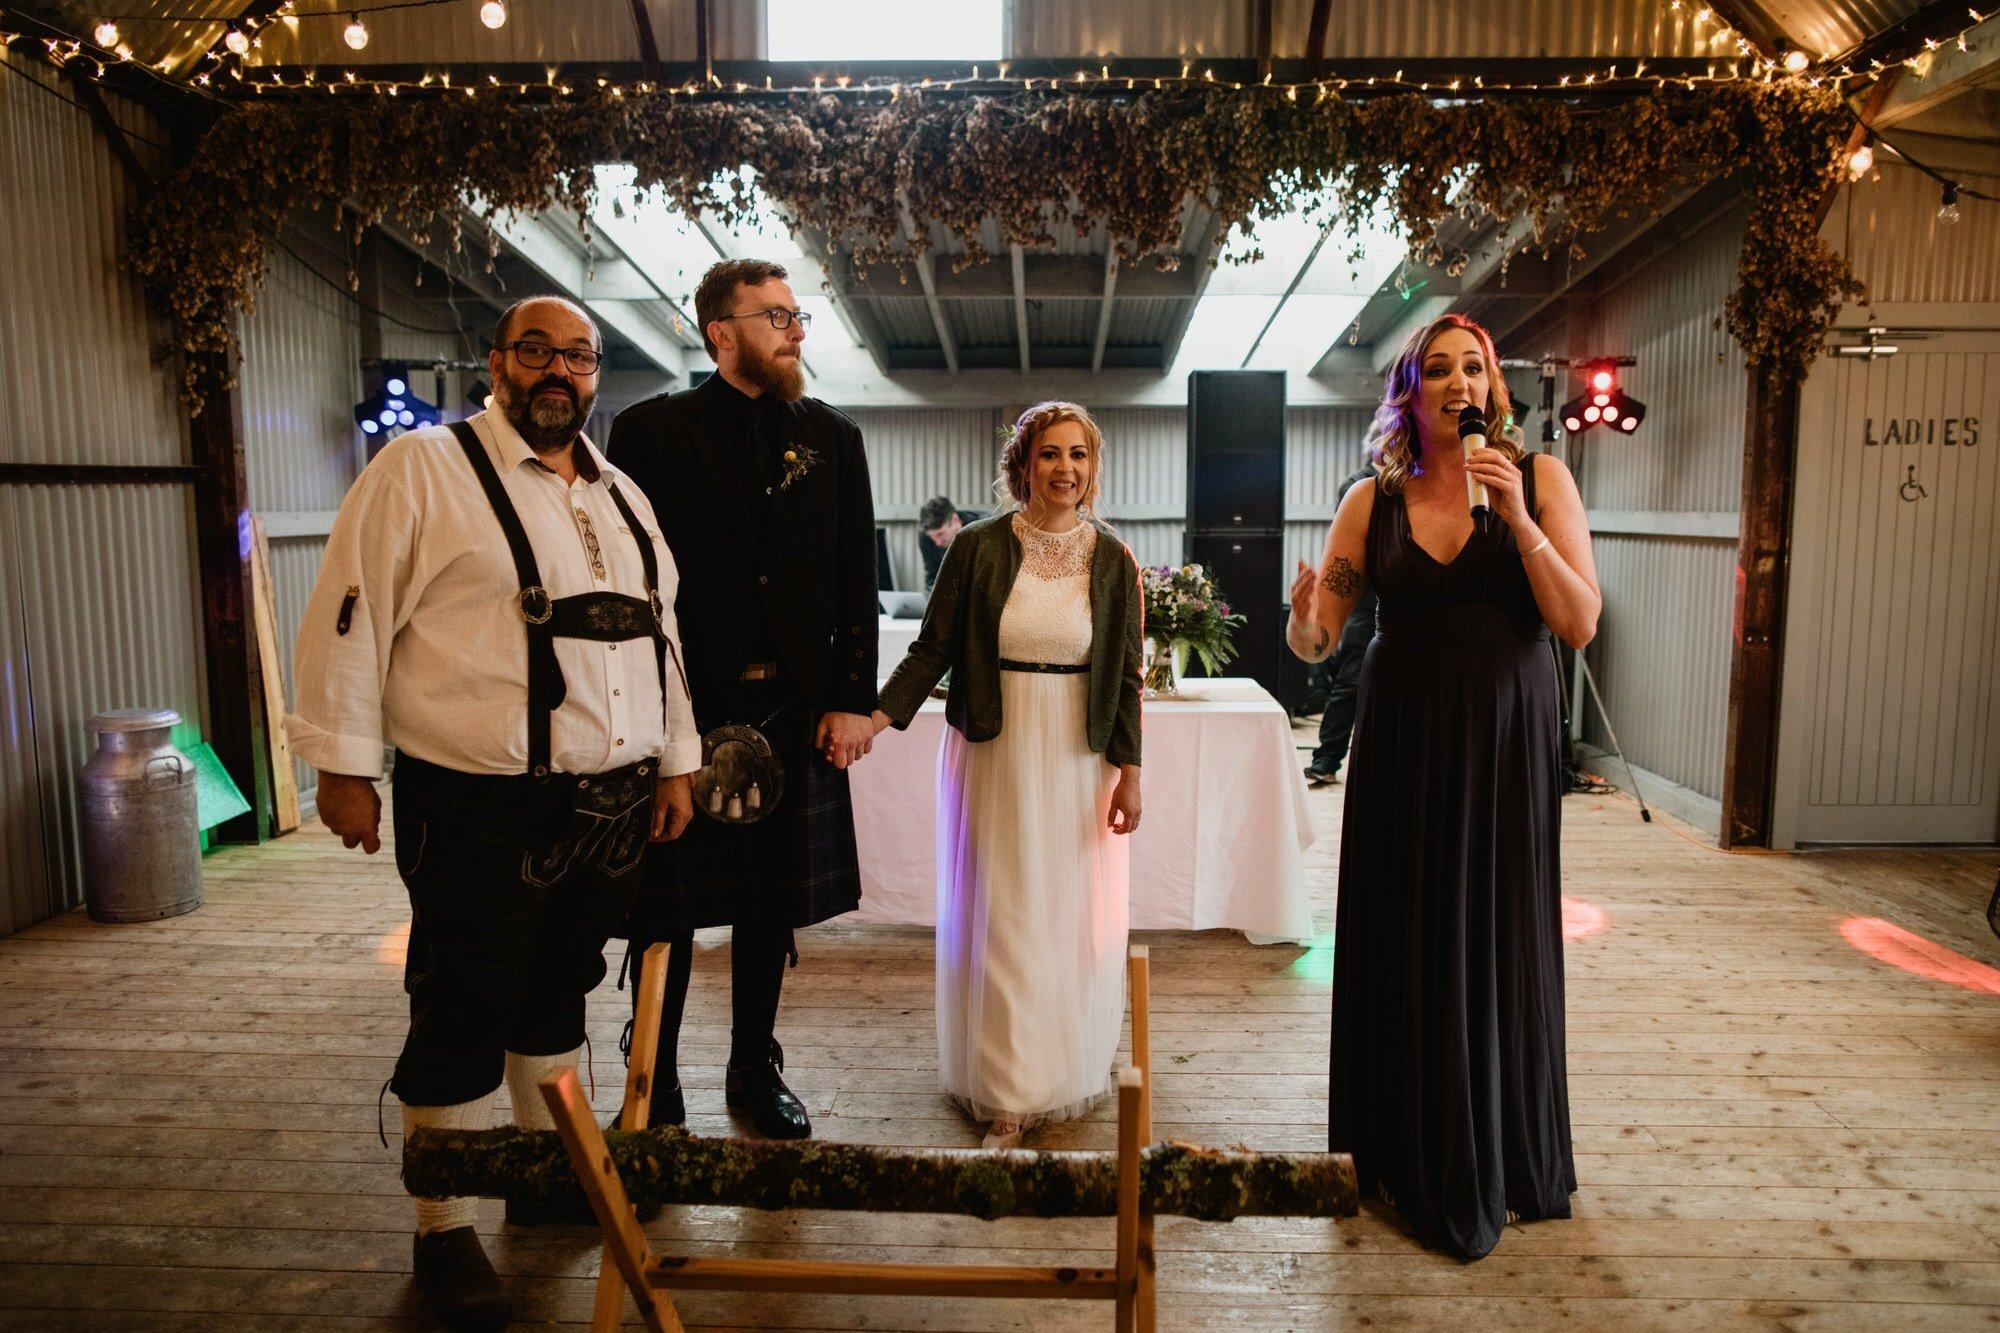 053 TIN SHED KNOCKRAICH WEDDING AUSTRIAN SCOTTISH ZOE ALEXANDRA PHOTOGRAPHY